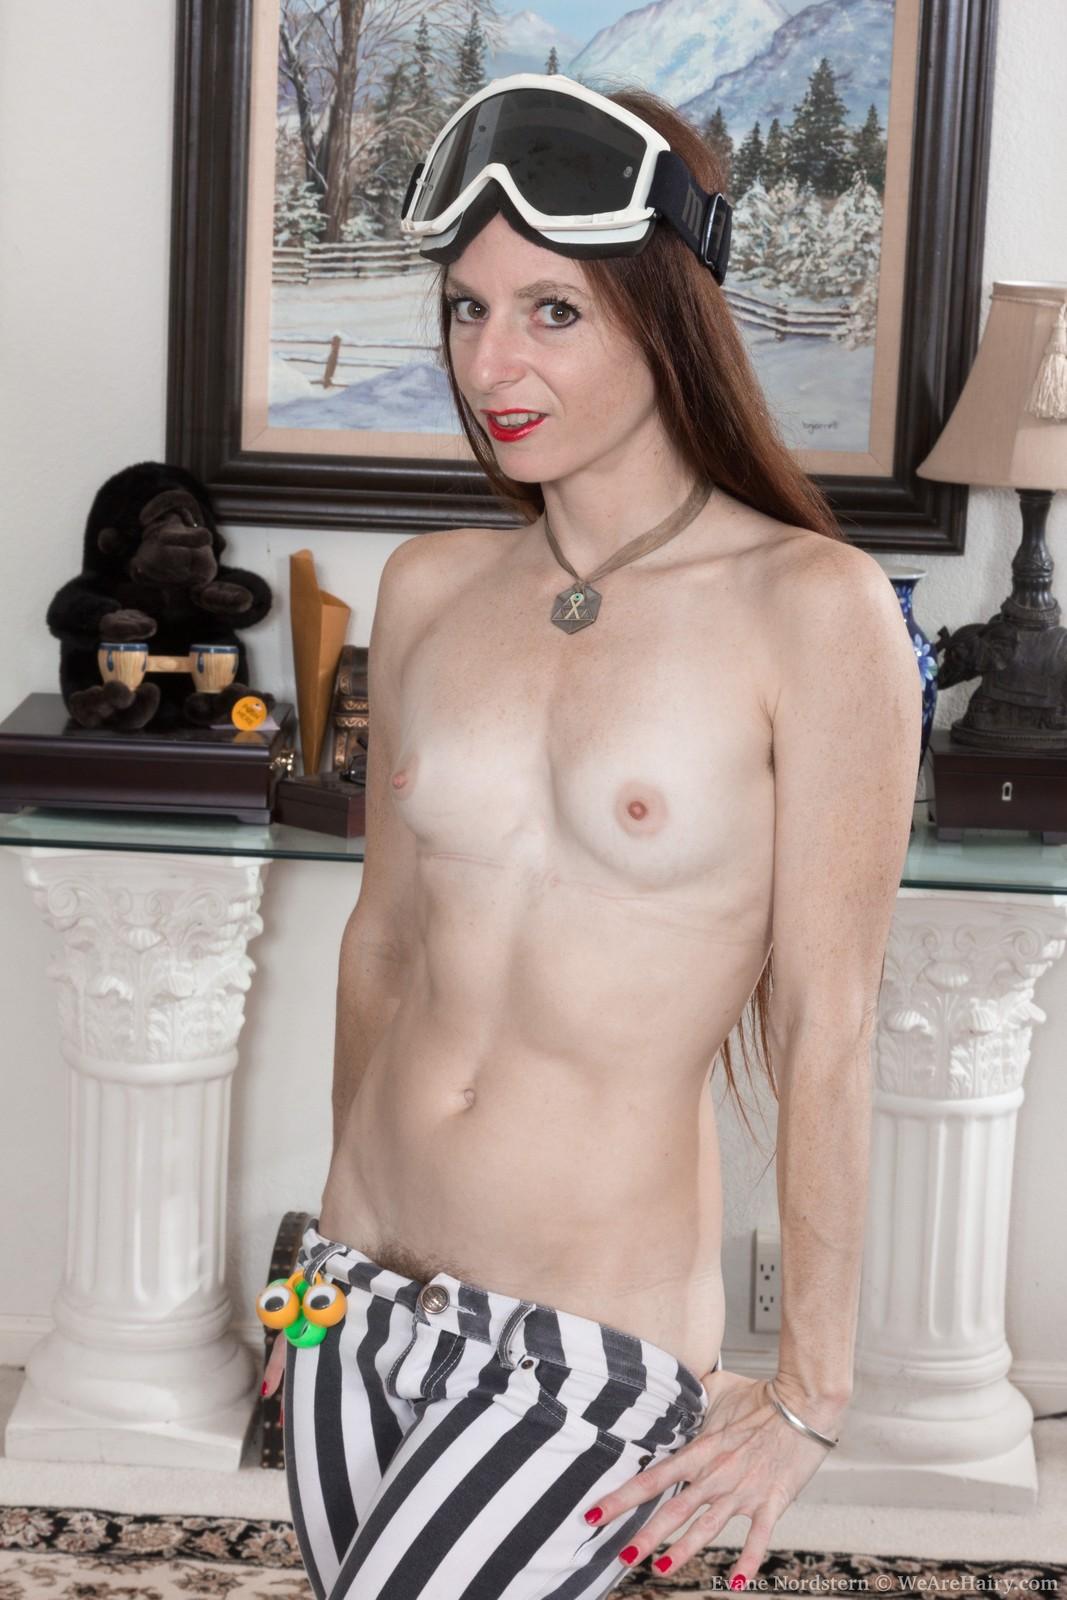 evane-nordstern-strips-naked-in-her-living-room6.jpg